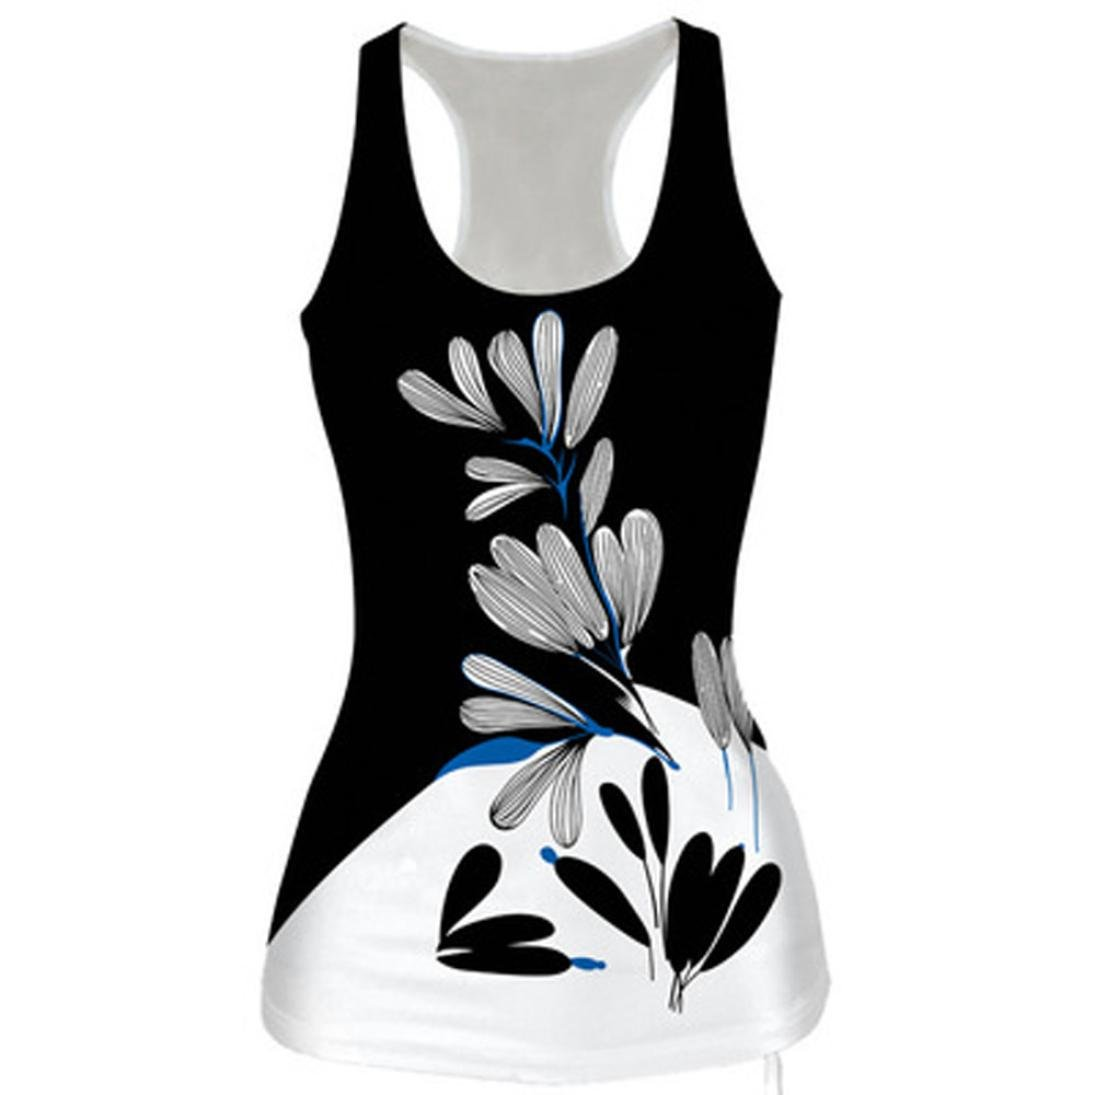 QUINTRA Women Summer Sleeveless Slim Print Vest Tank Top Bodysuit T-Shirt Blouse